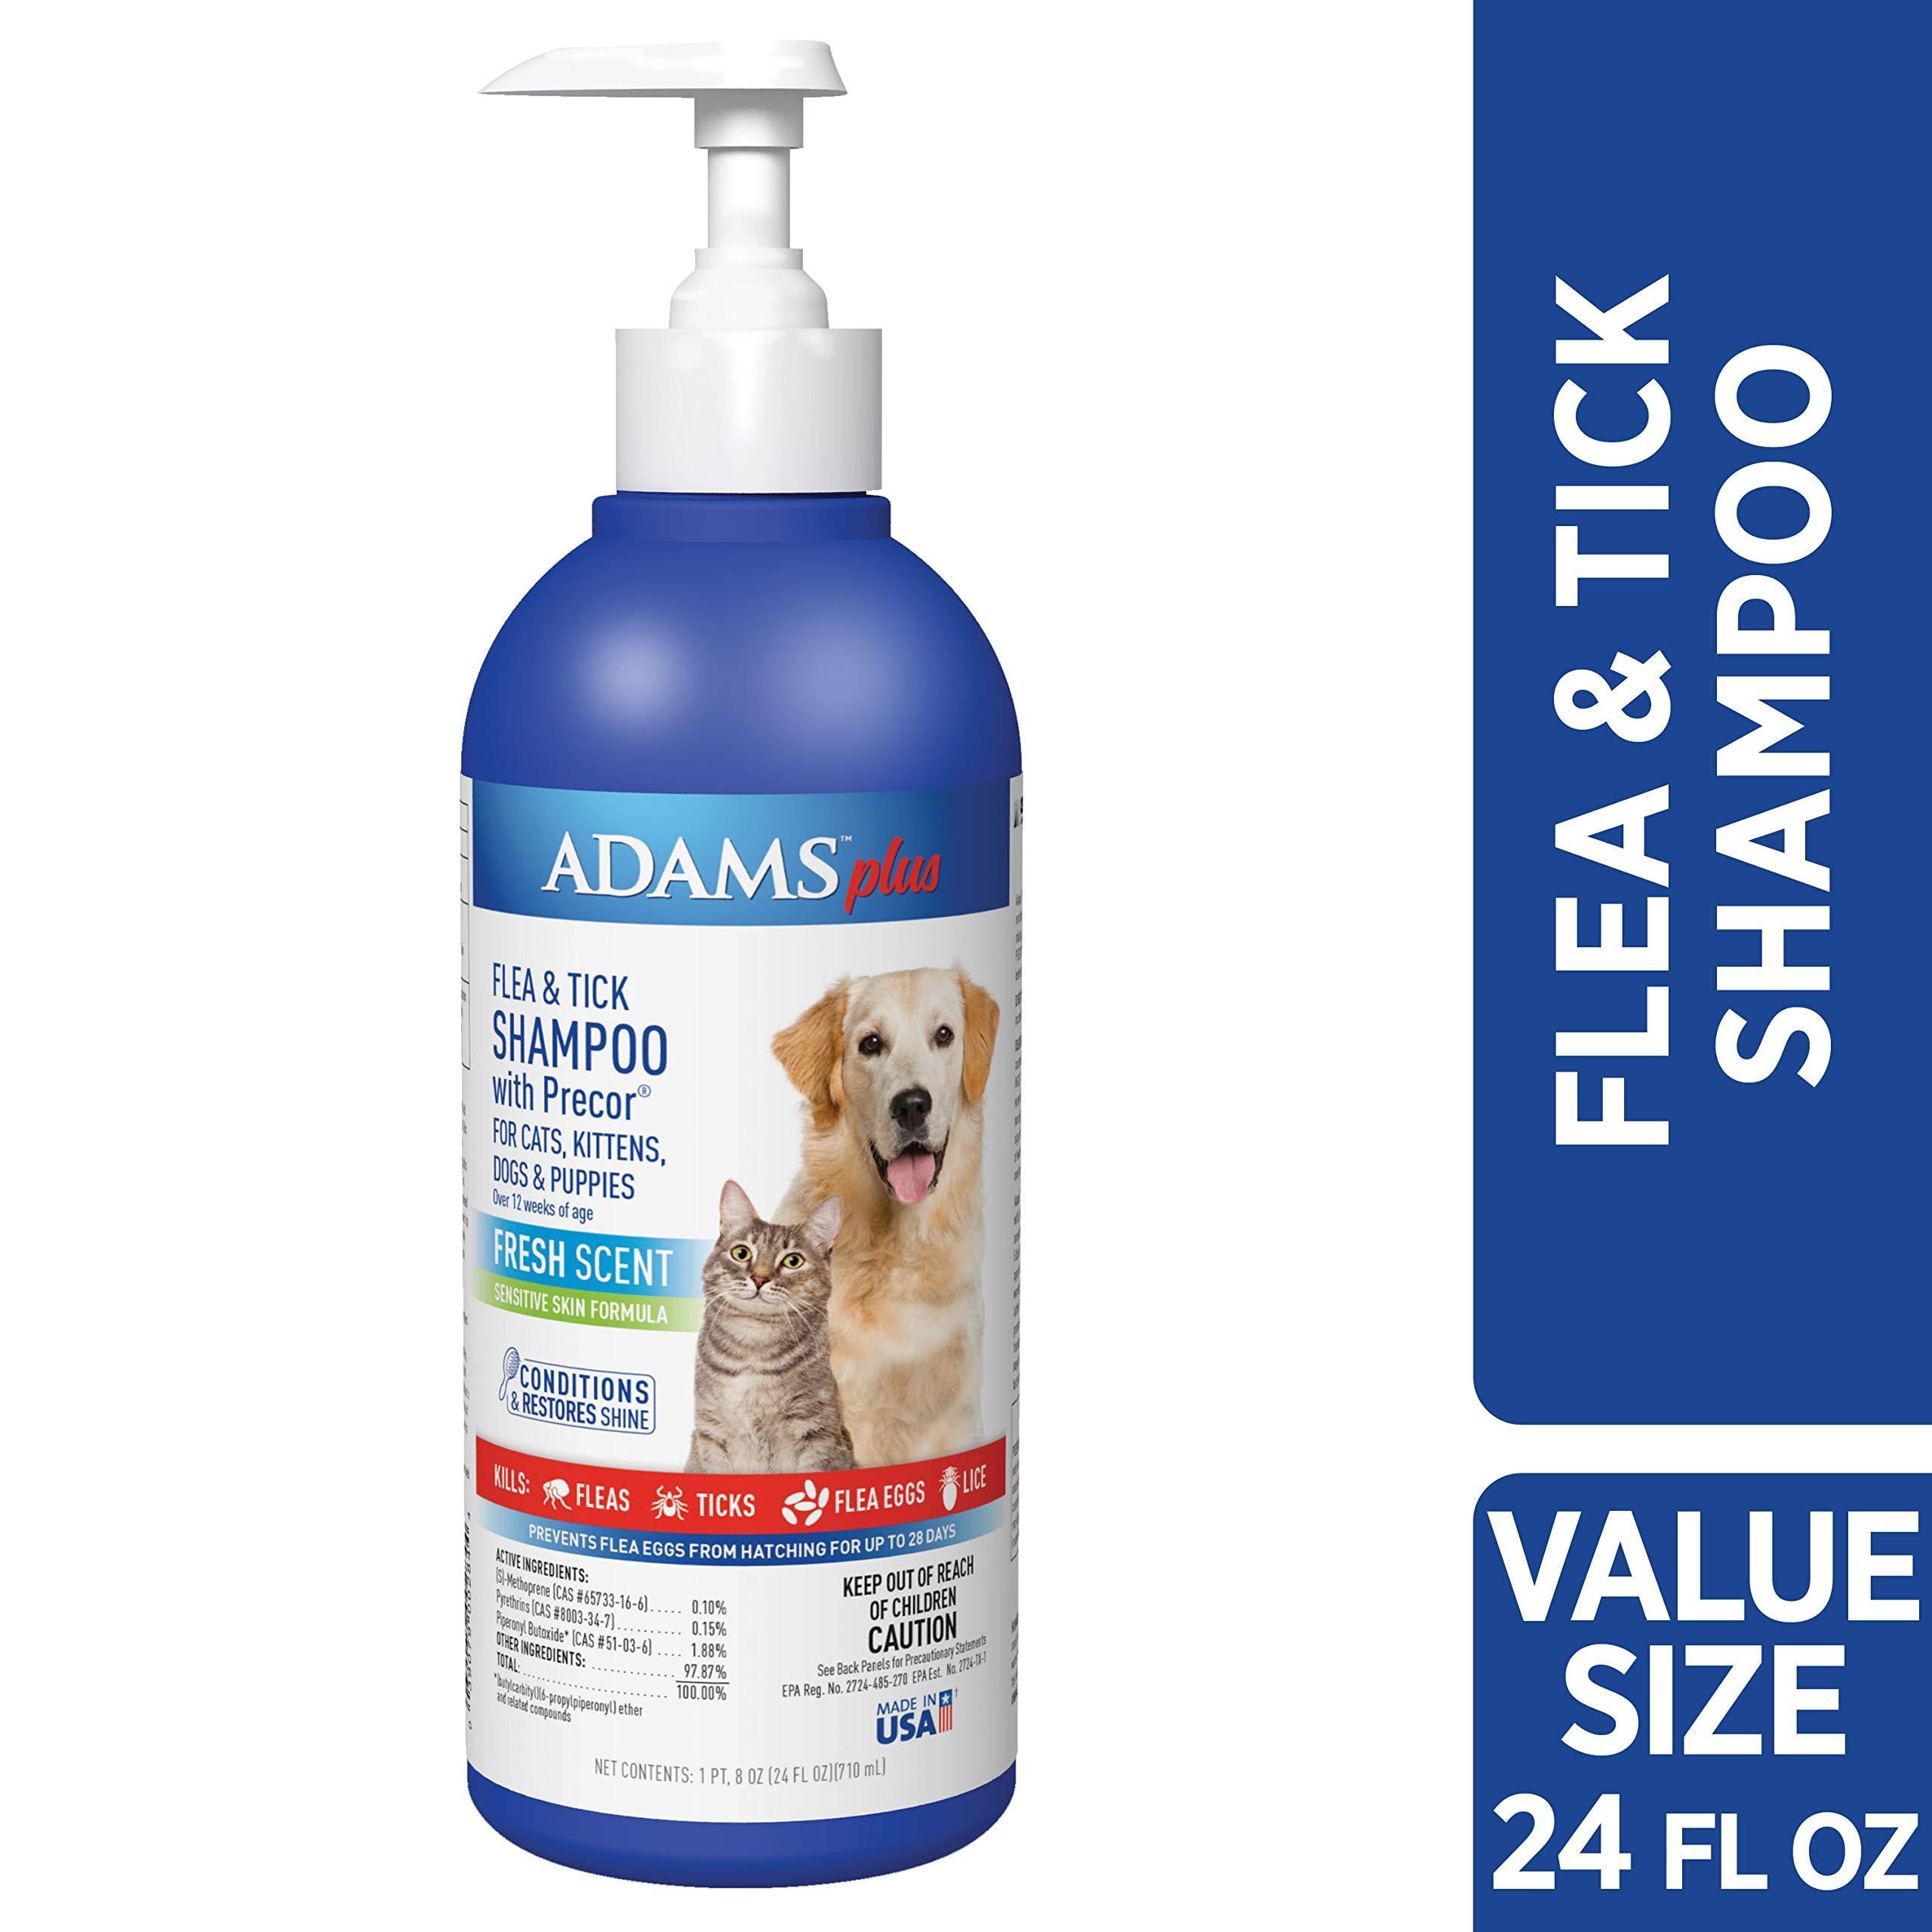 Adams Plus Flea & Tick Shampoo with Precor, 24-Ounce, Blue by Adams